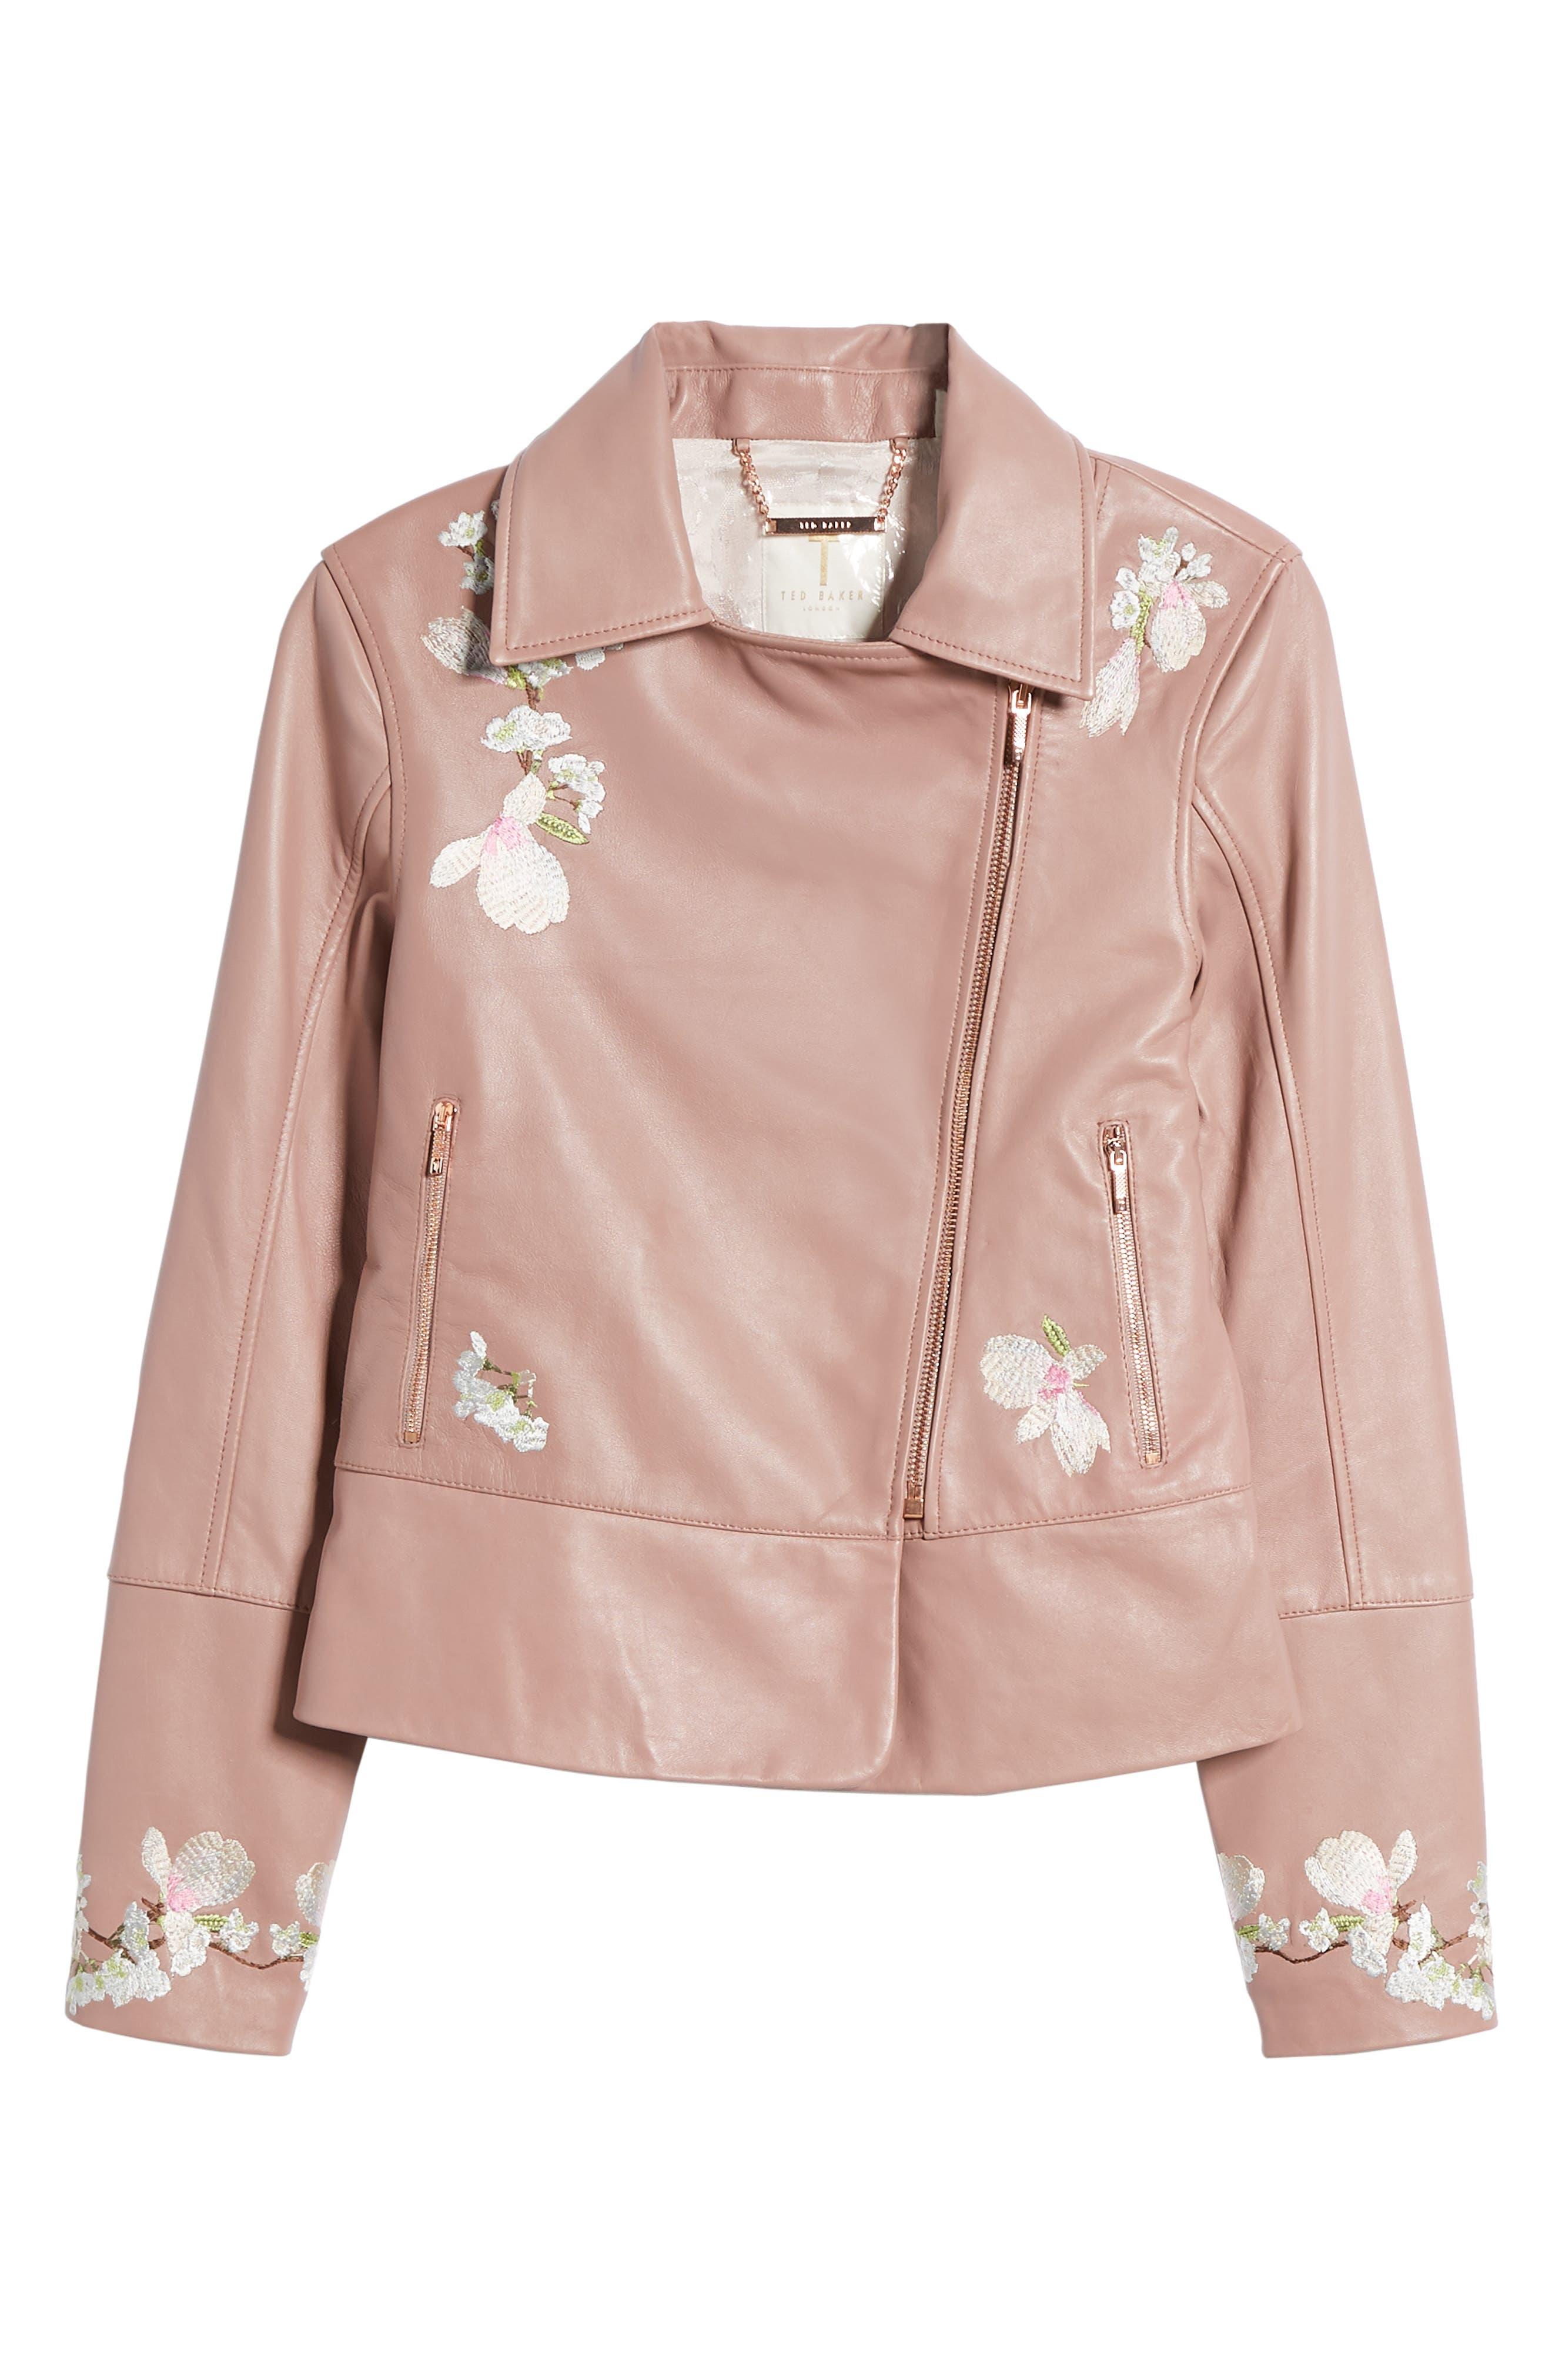 Harmony Embroidered Leather Biker Jacket,                             Alternate thumbnail 7, color,                             Dusky Pink